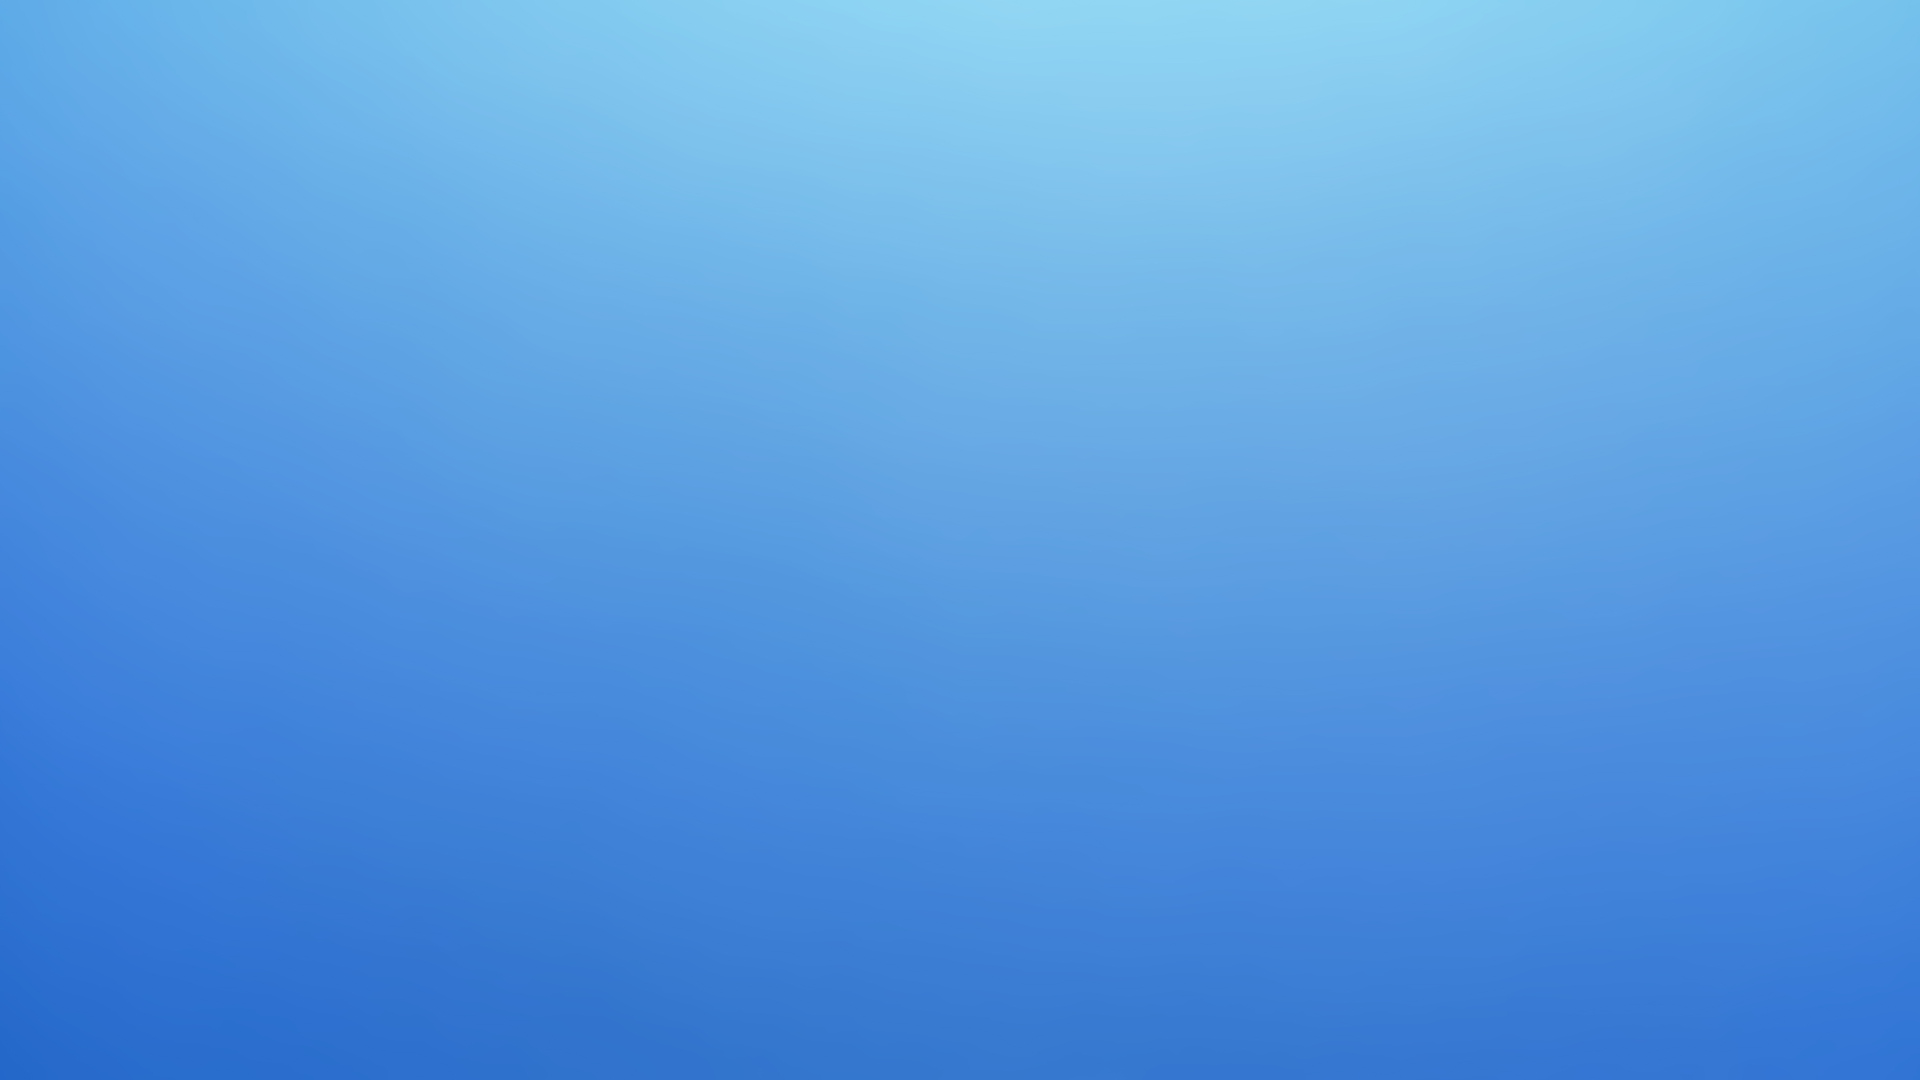 blue sky brigtht to the top 1920x1080